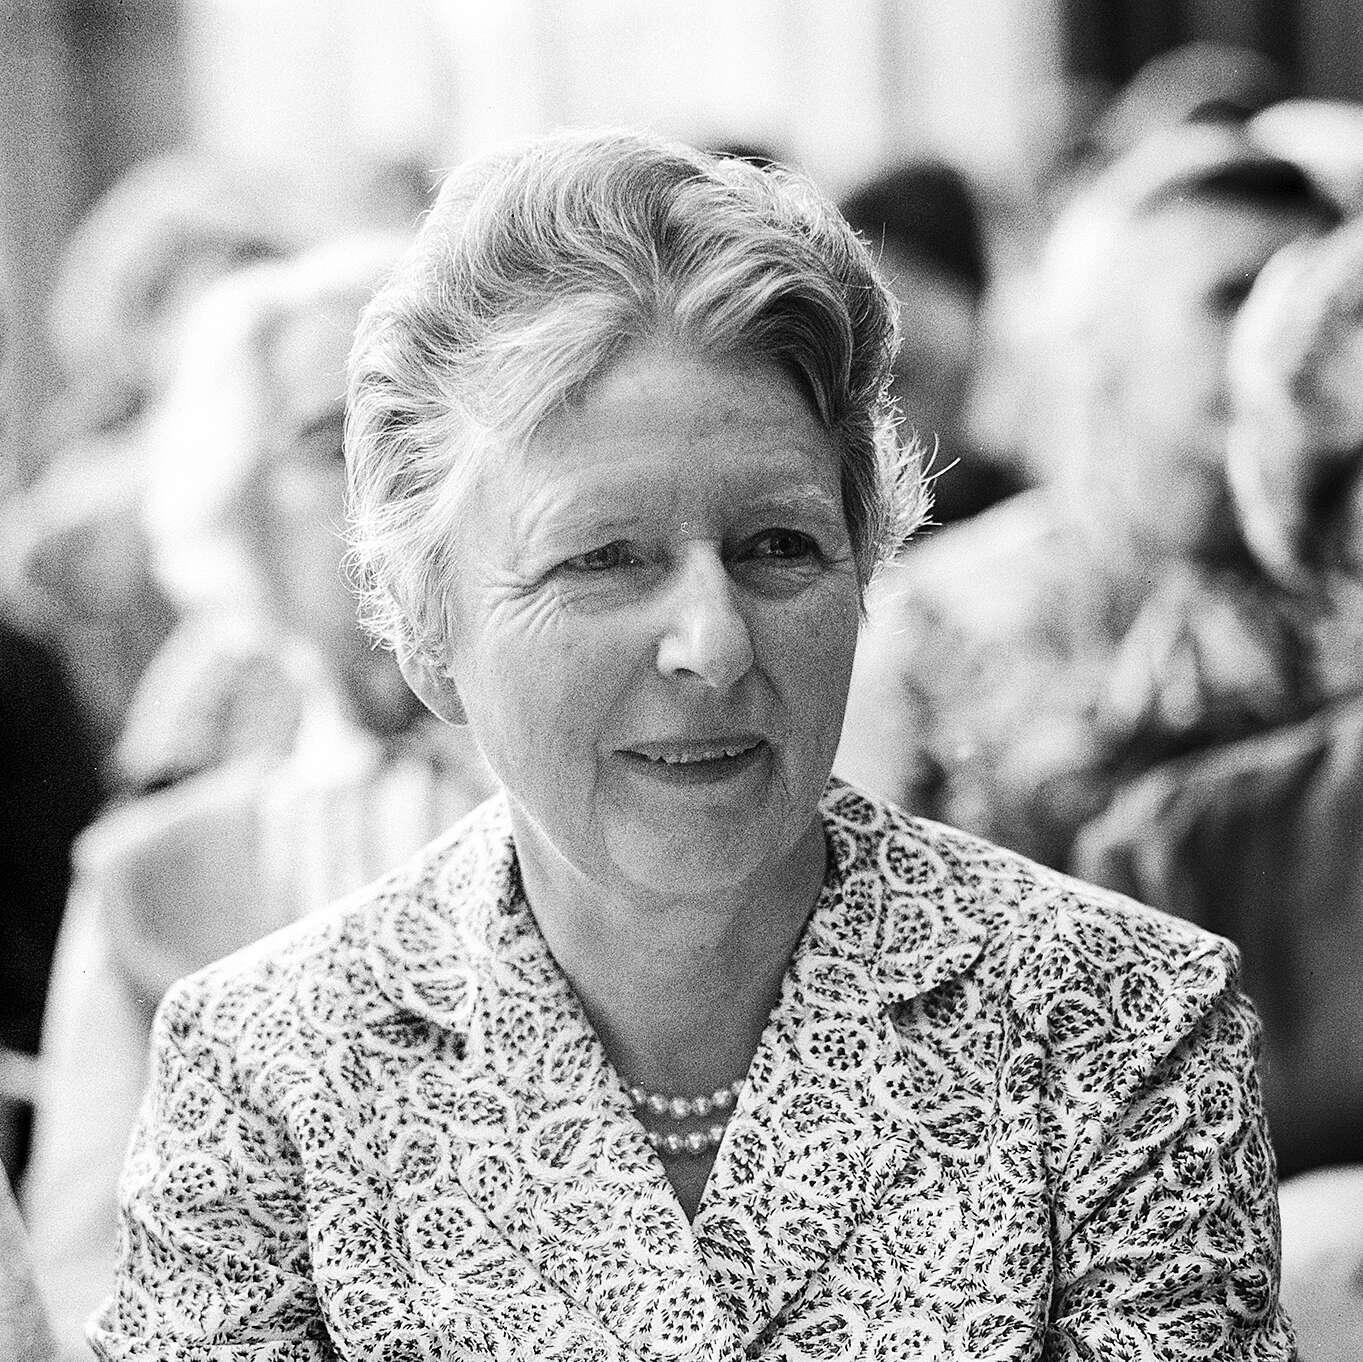 Gertrud Heinzelmann</span><span>